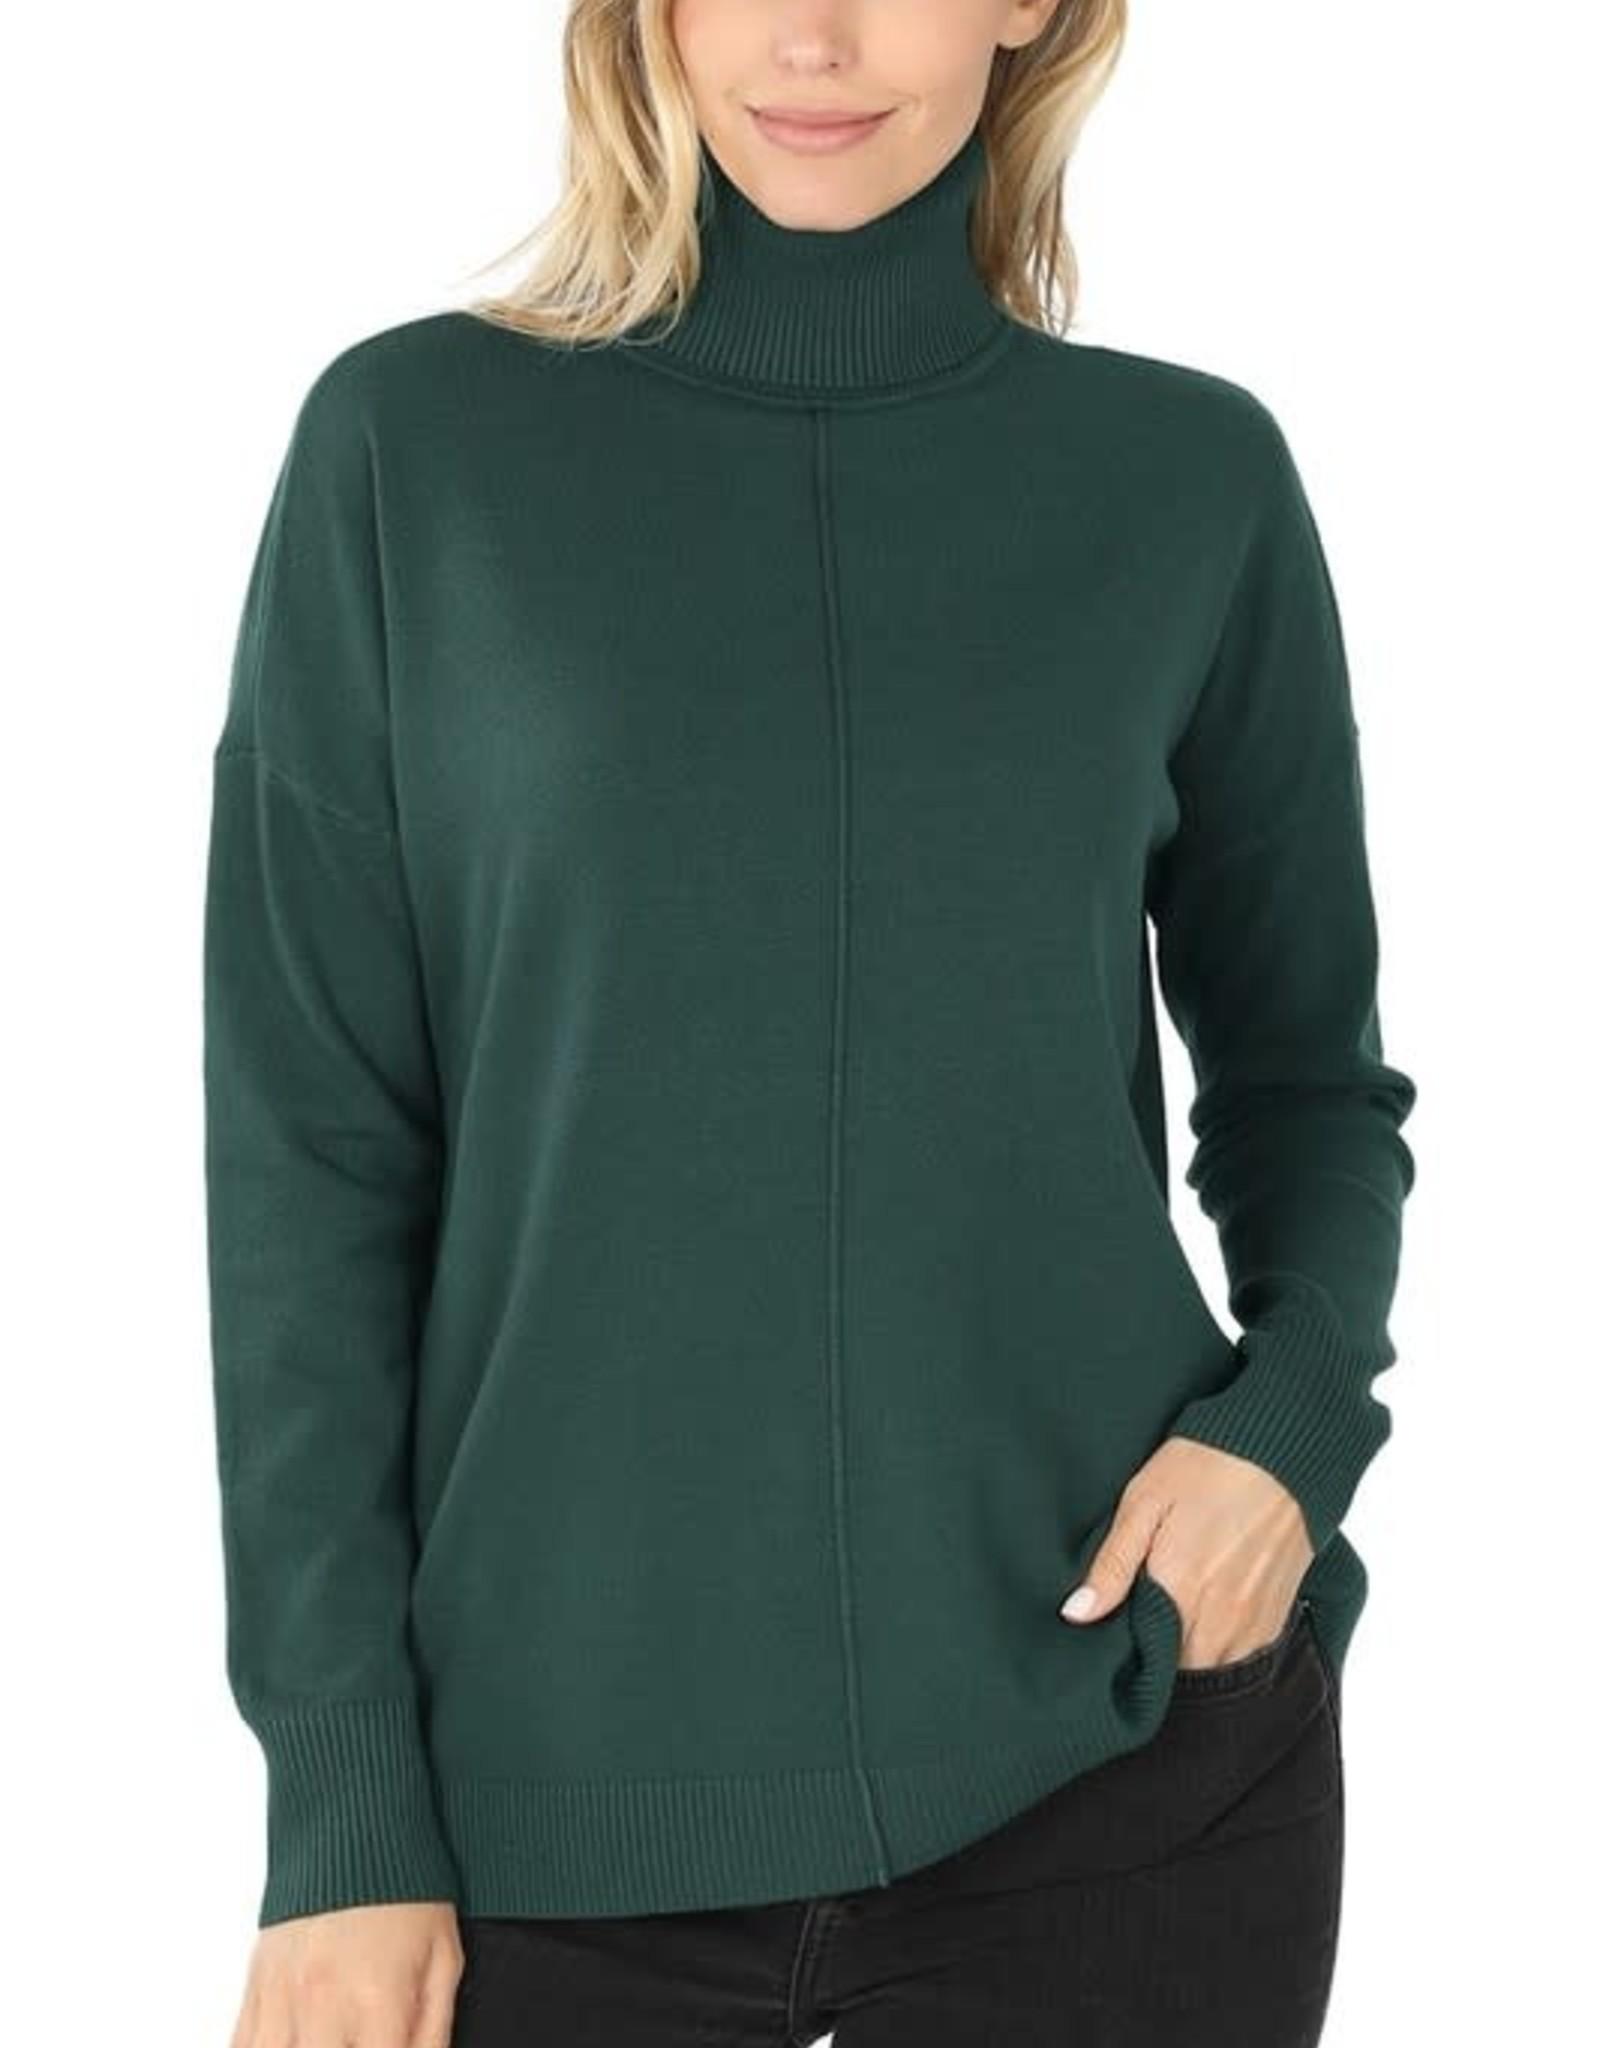 - Hunter Green Hi-Low Center Seam Turtleneck Sweater